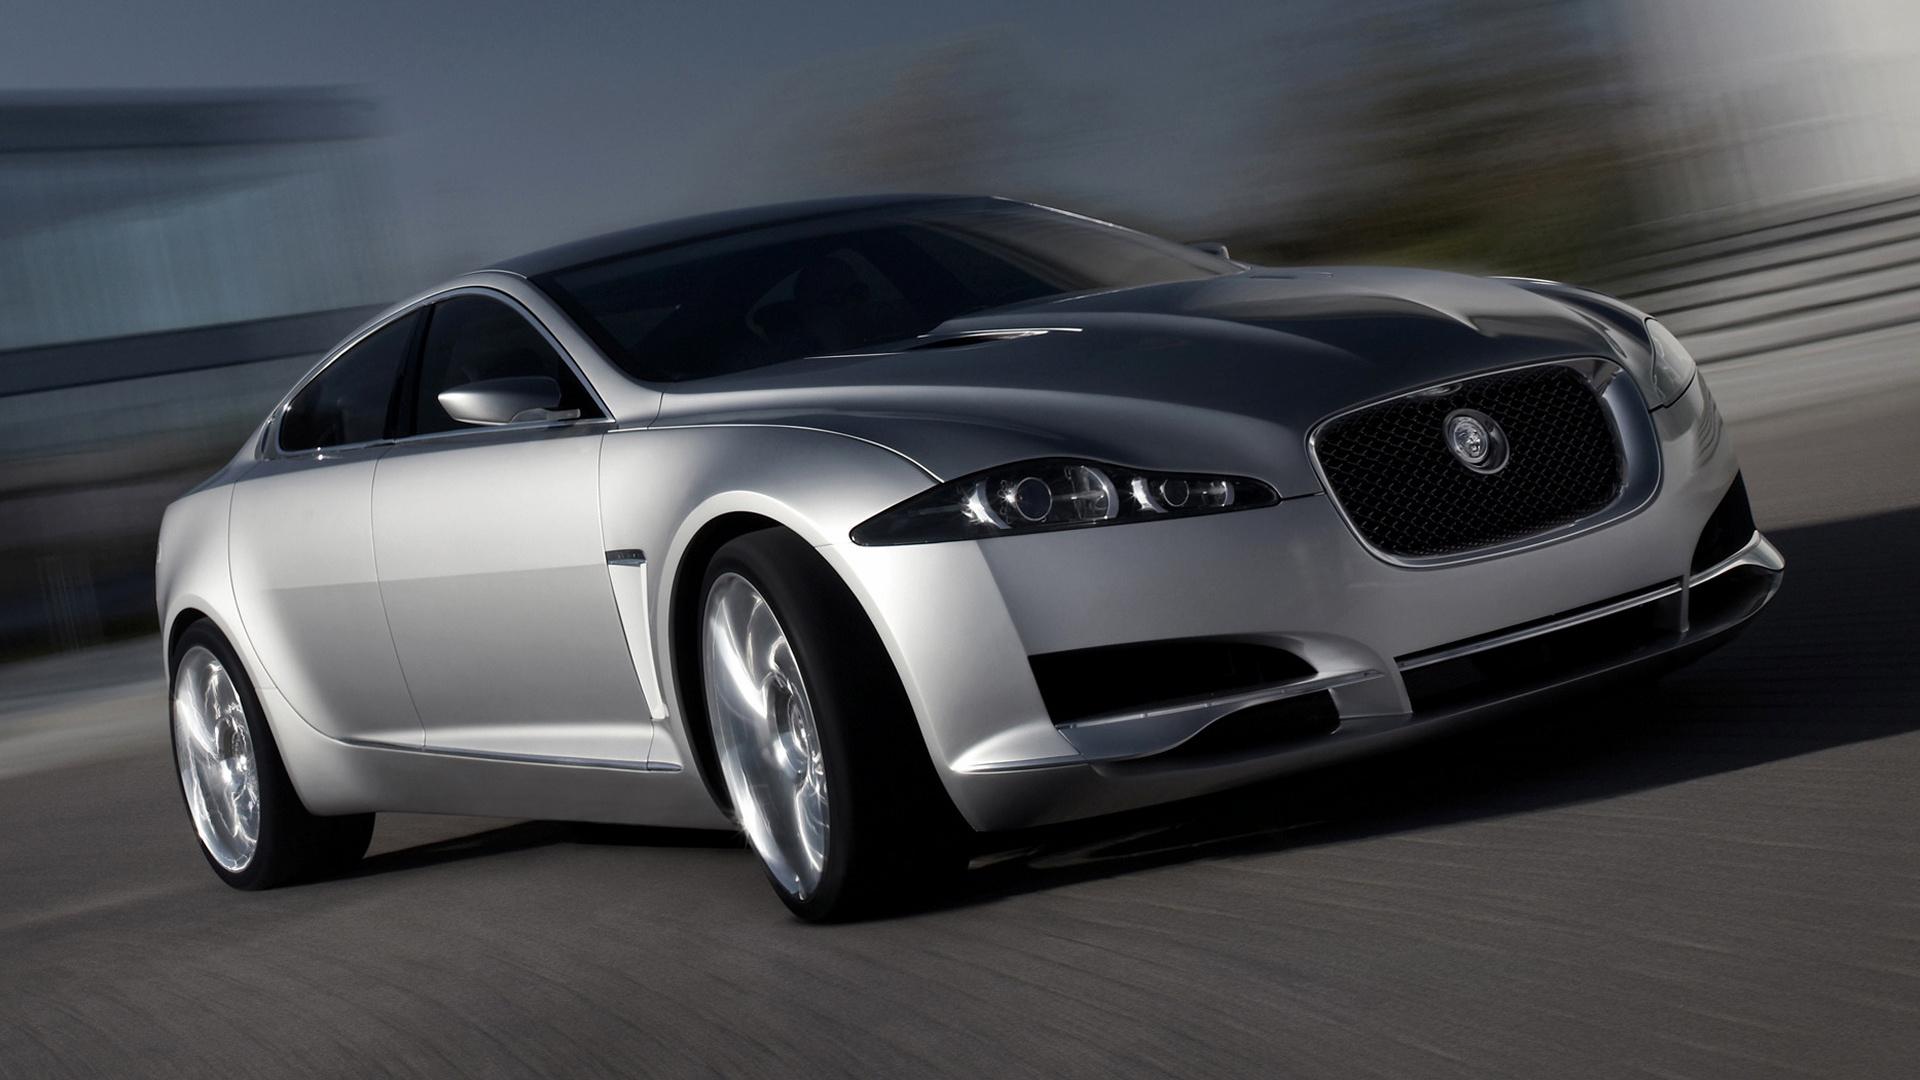 2007 Jaguar C-XF Concept - Wallpapers and HD Images | Car ...